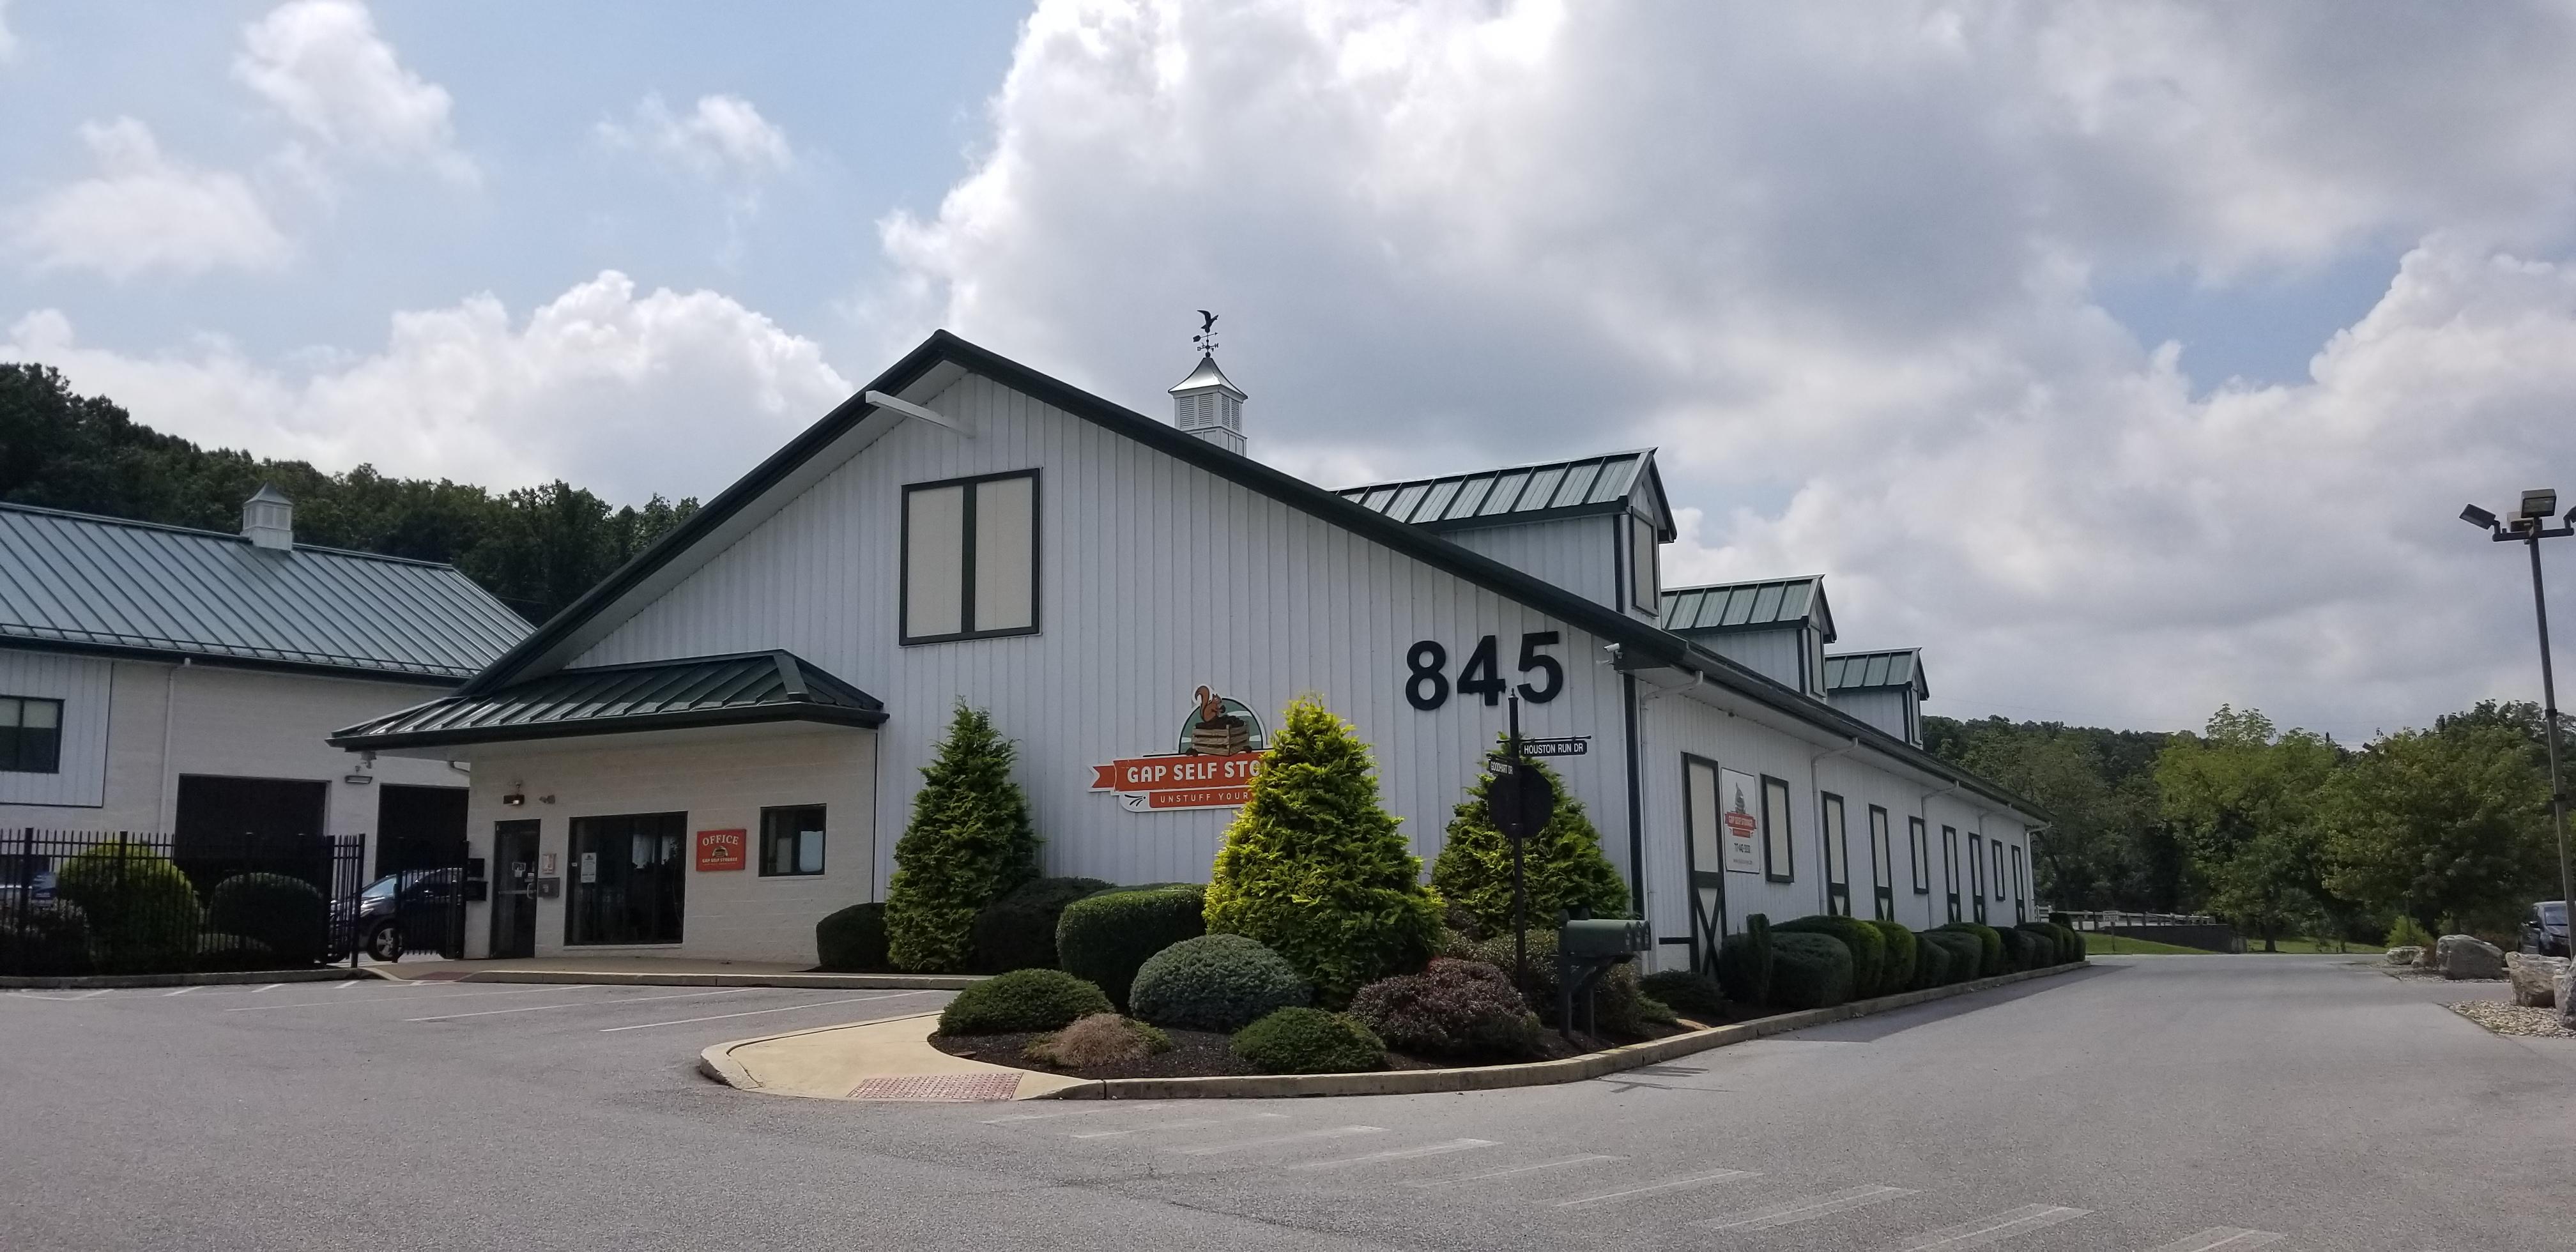 Storage in Gap, PA